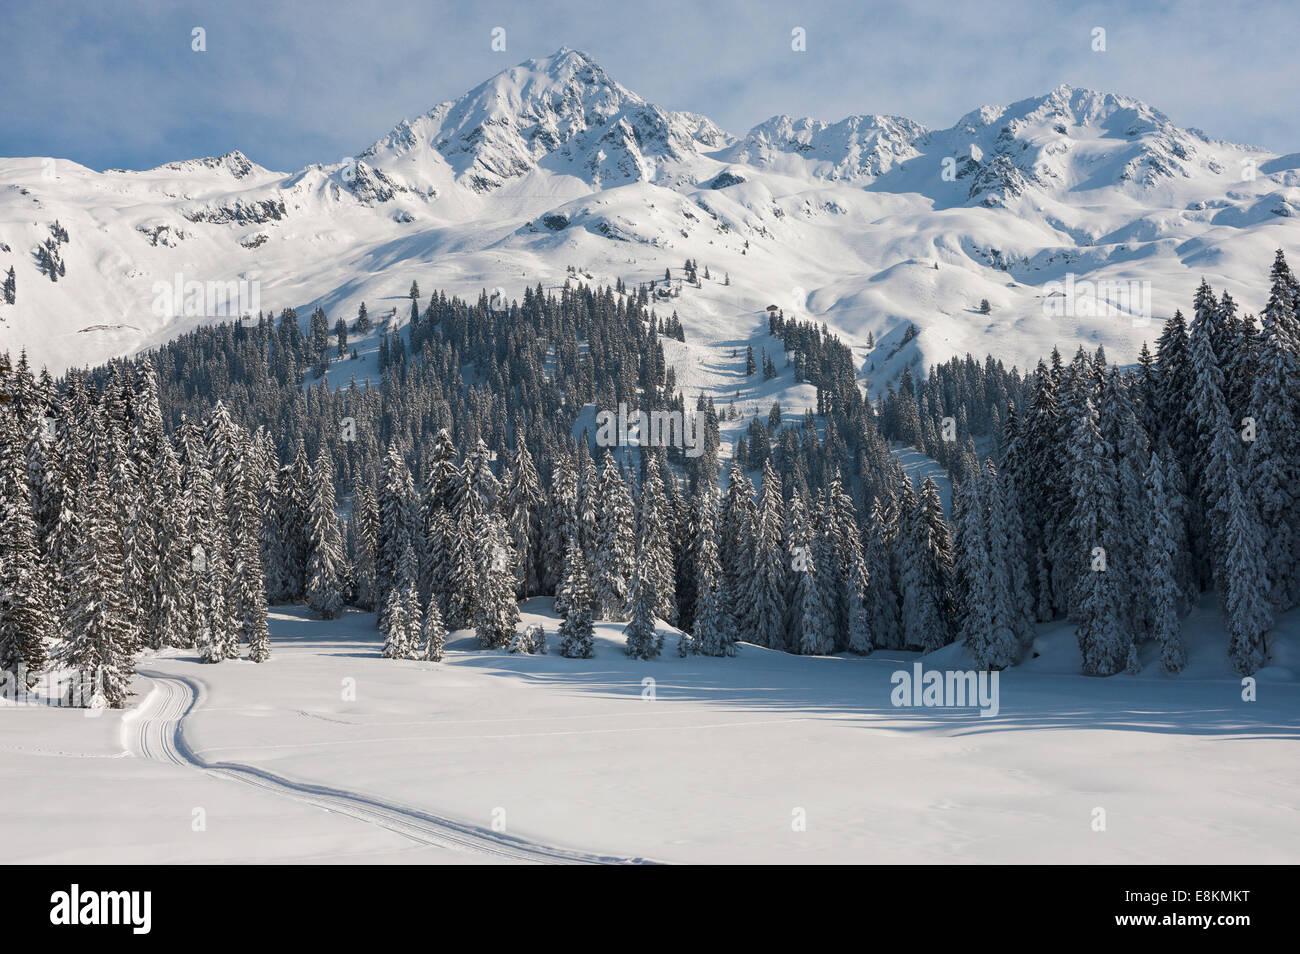 Snowy mountain landscape with fir forest, Kristbergbahn panoramic ski run, Silbertal, Montafon, Vorarlberg, Austria - Stock Image